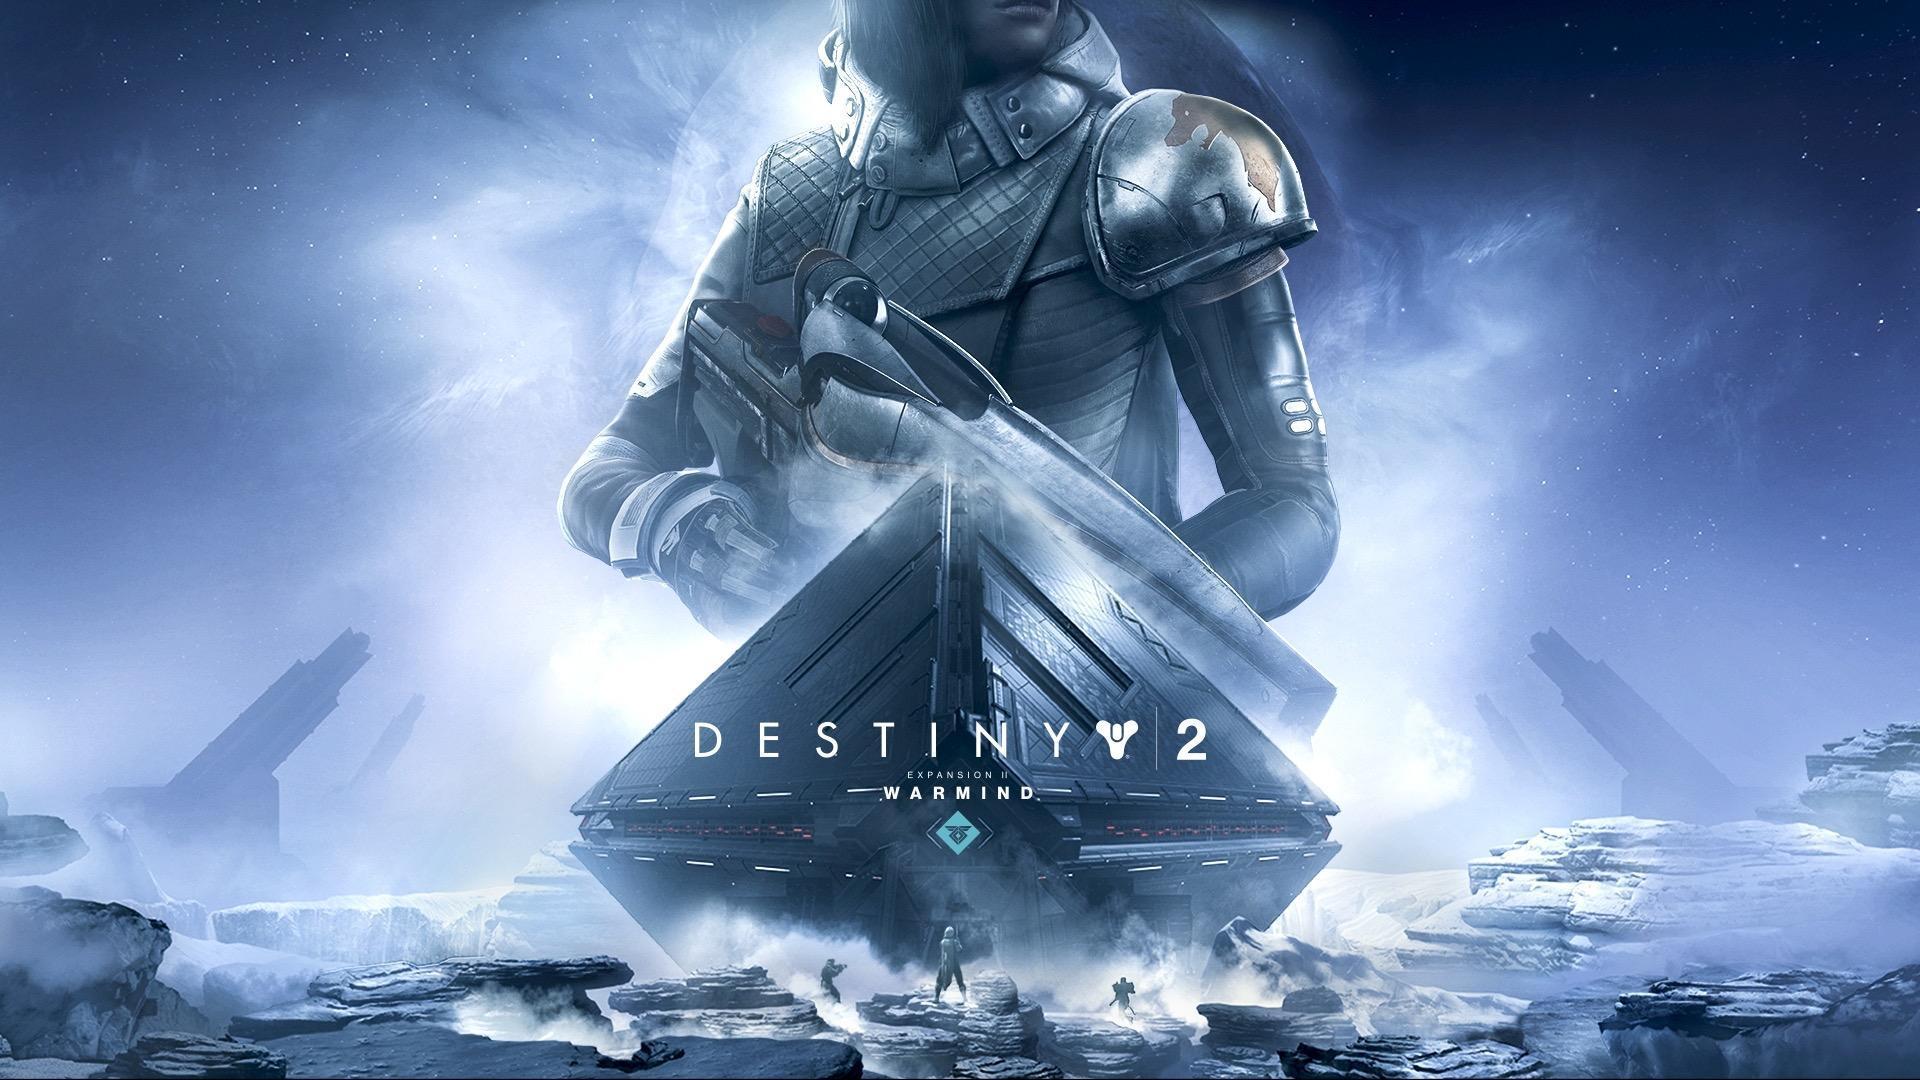 Destiny 2 Forsaken DLC Wallpapers - Wallpaper Cave